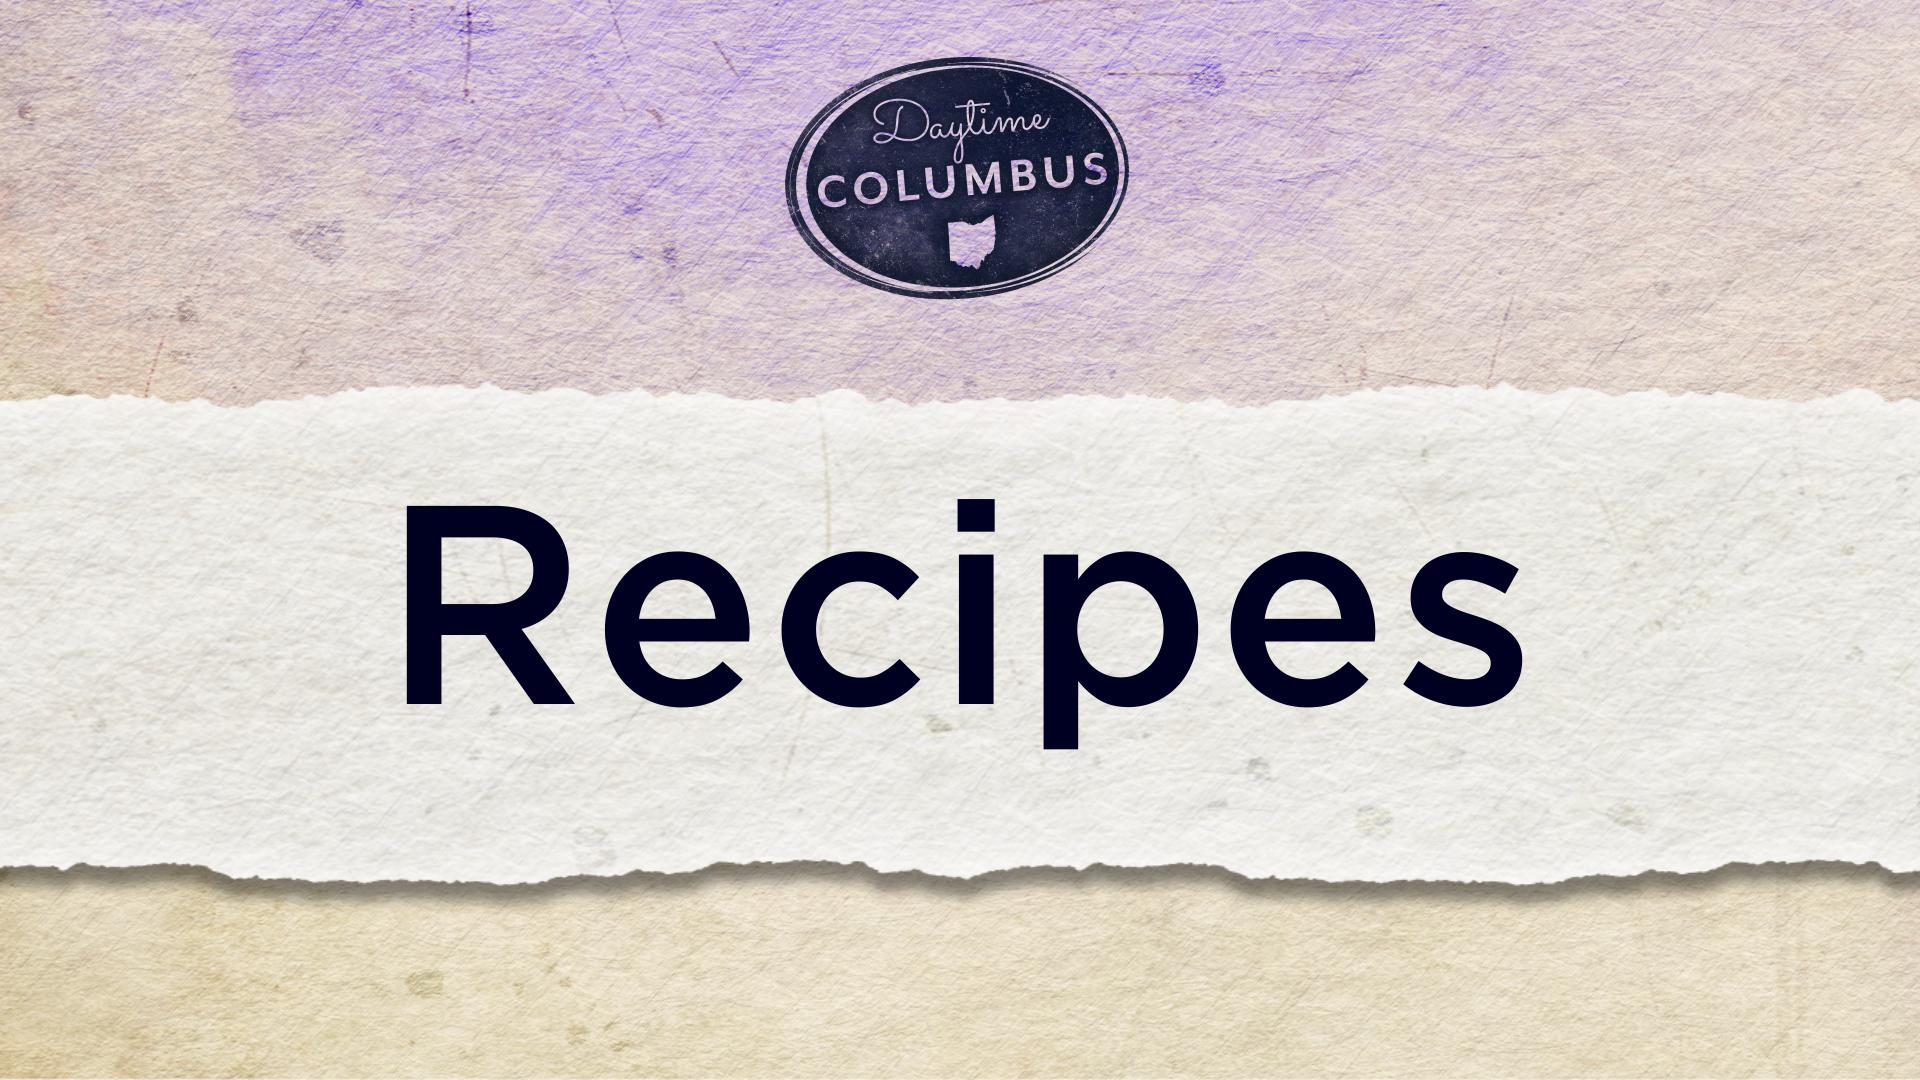 Daytime Columbus Recipes